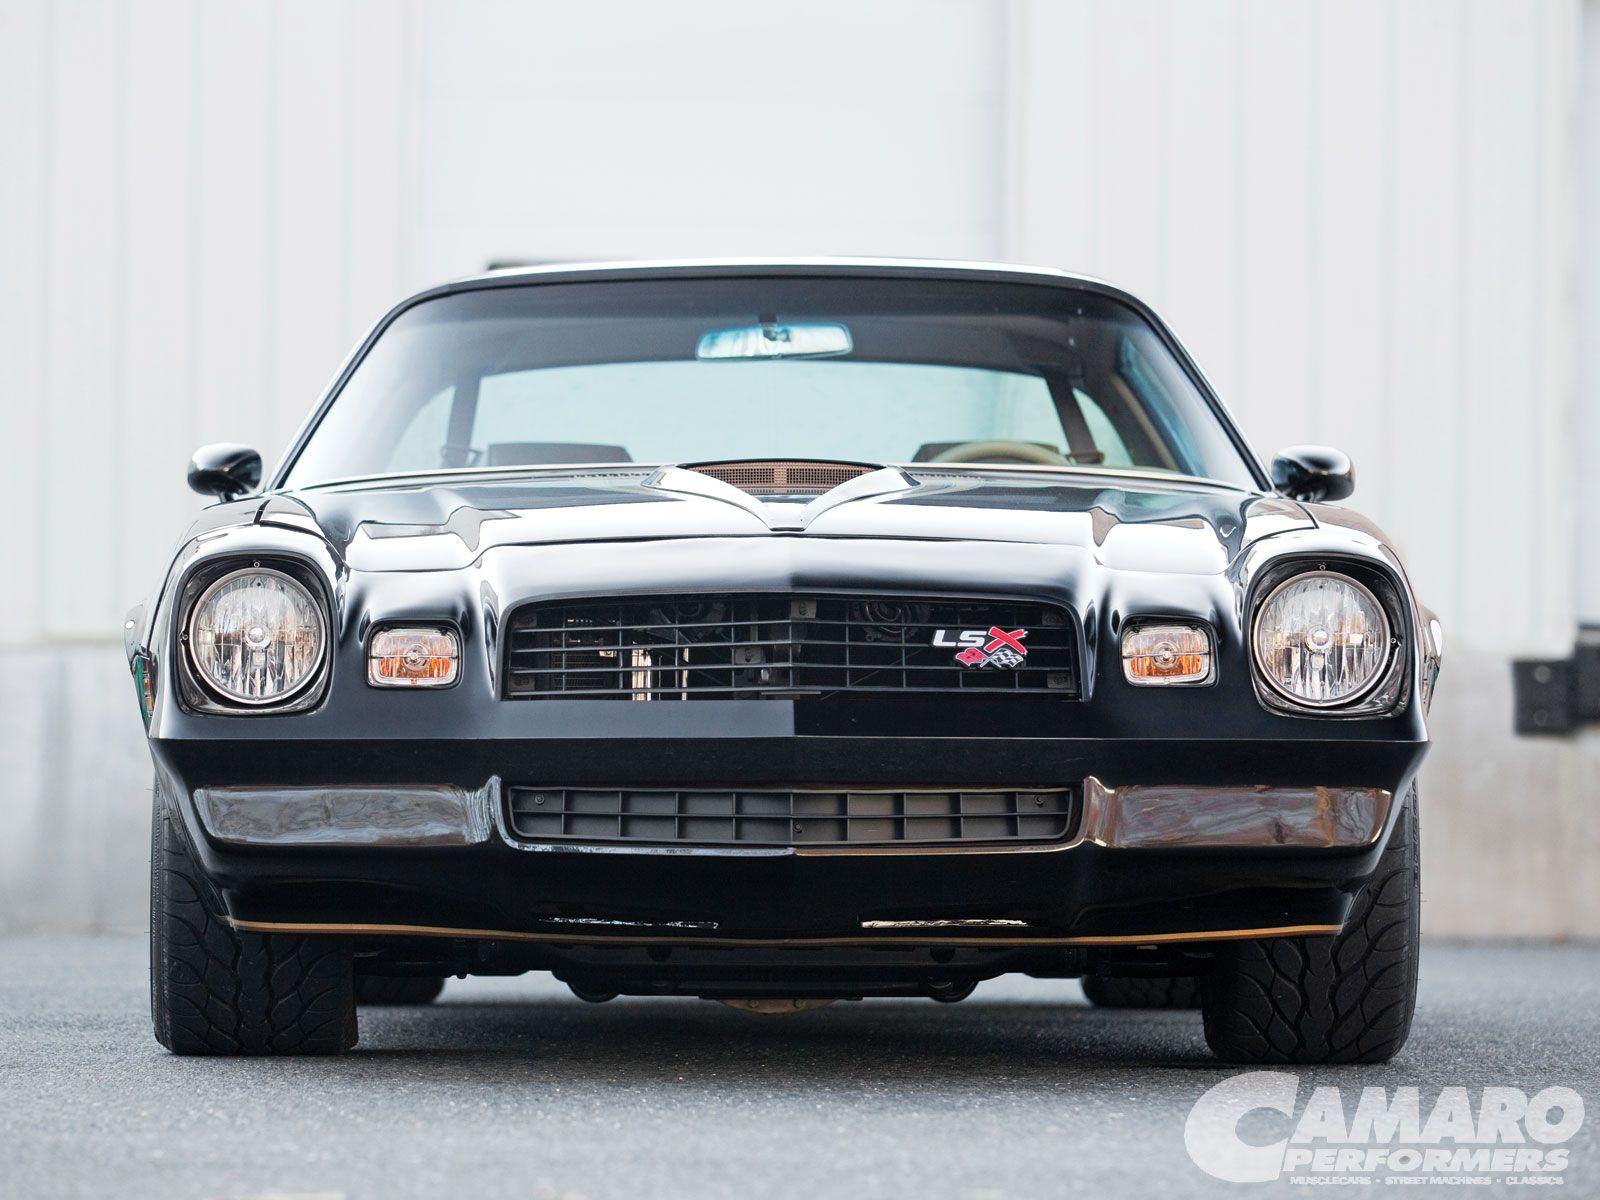 1978 Chevrolet Camaro Z28 – Facebooked